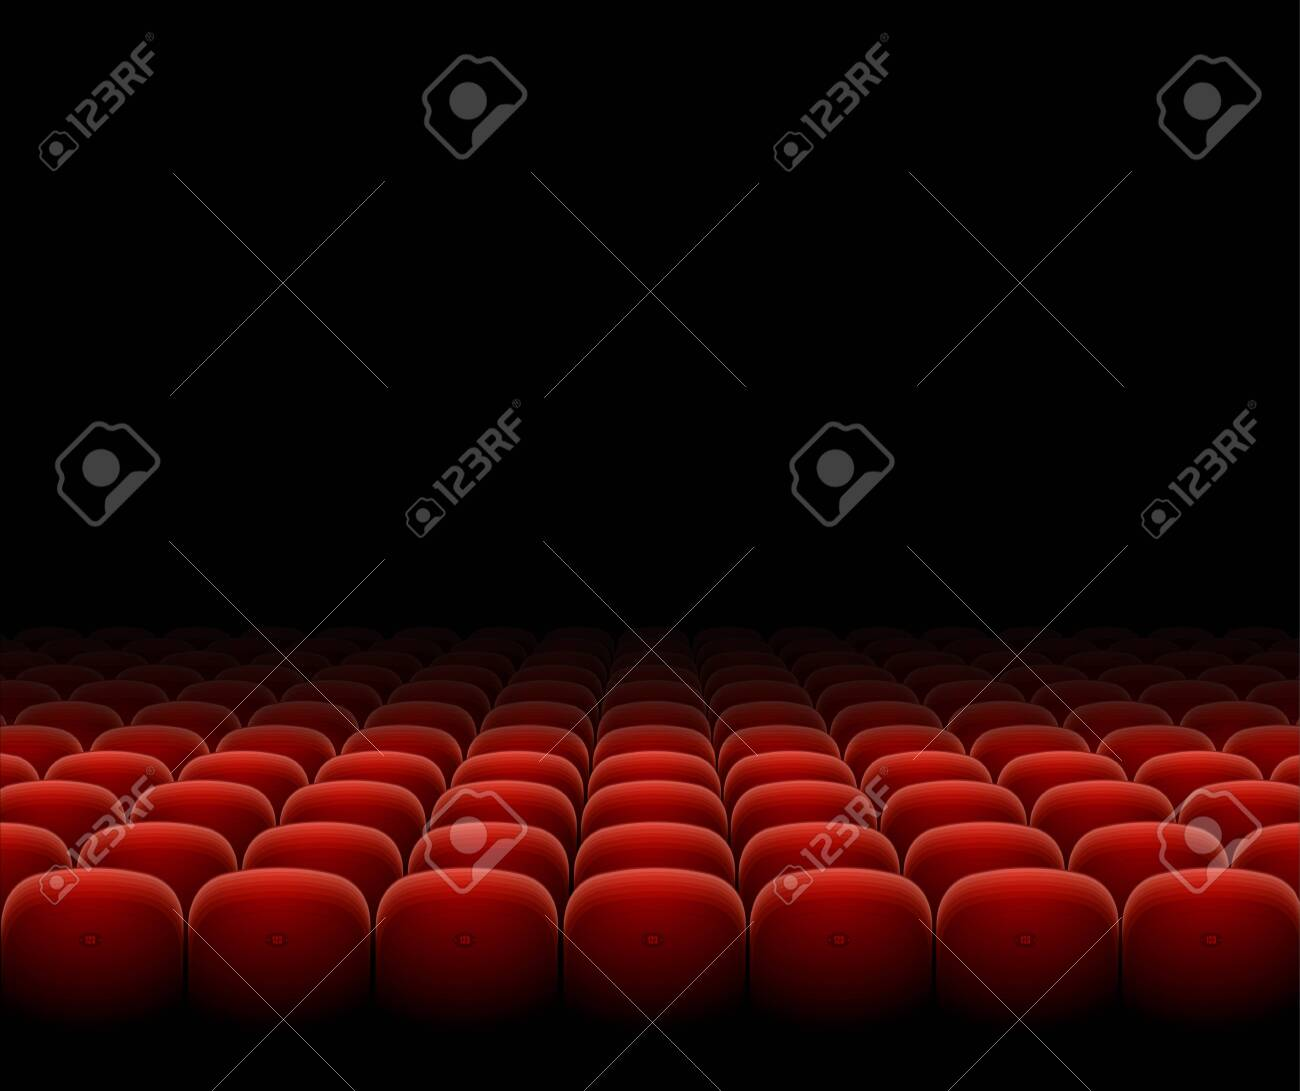 Cinema Theater Red Seats Row Set on a Dark. Vector - 152348117